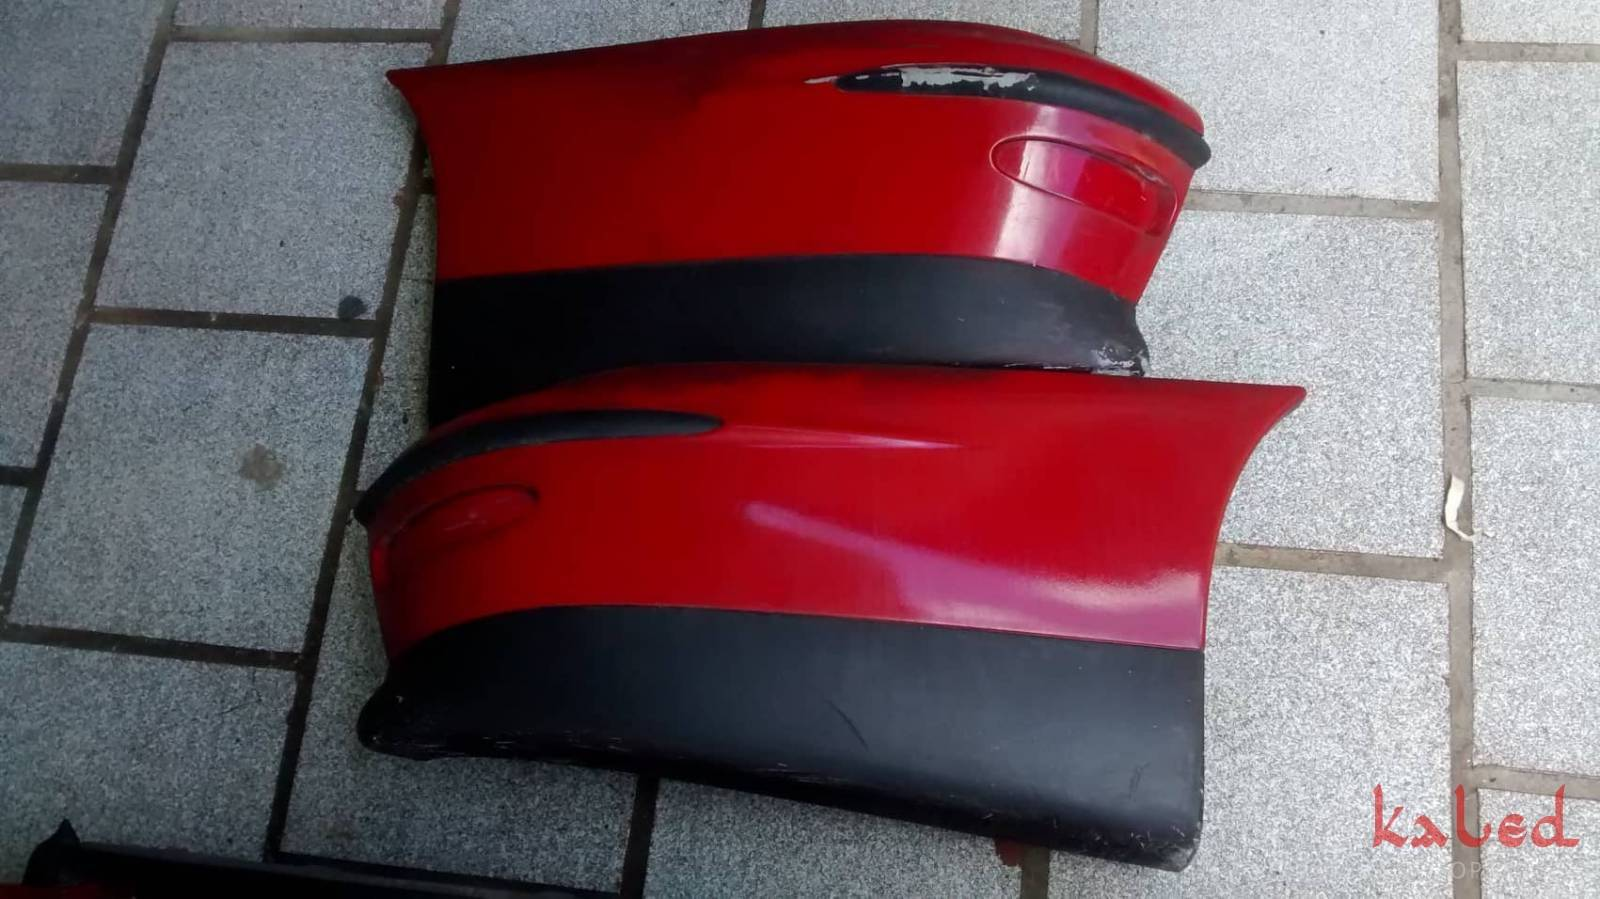 Parachoque traseiro do Fiat Marea Weekend 1999 a 2006 - Kaled Auto Parts